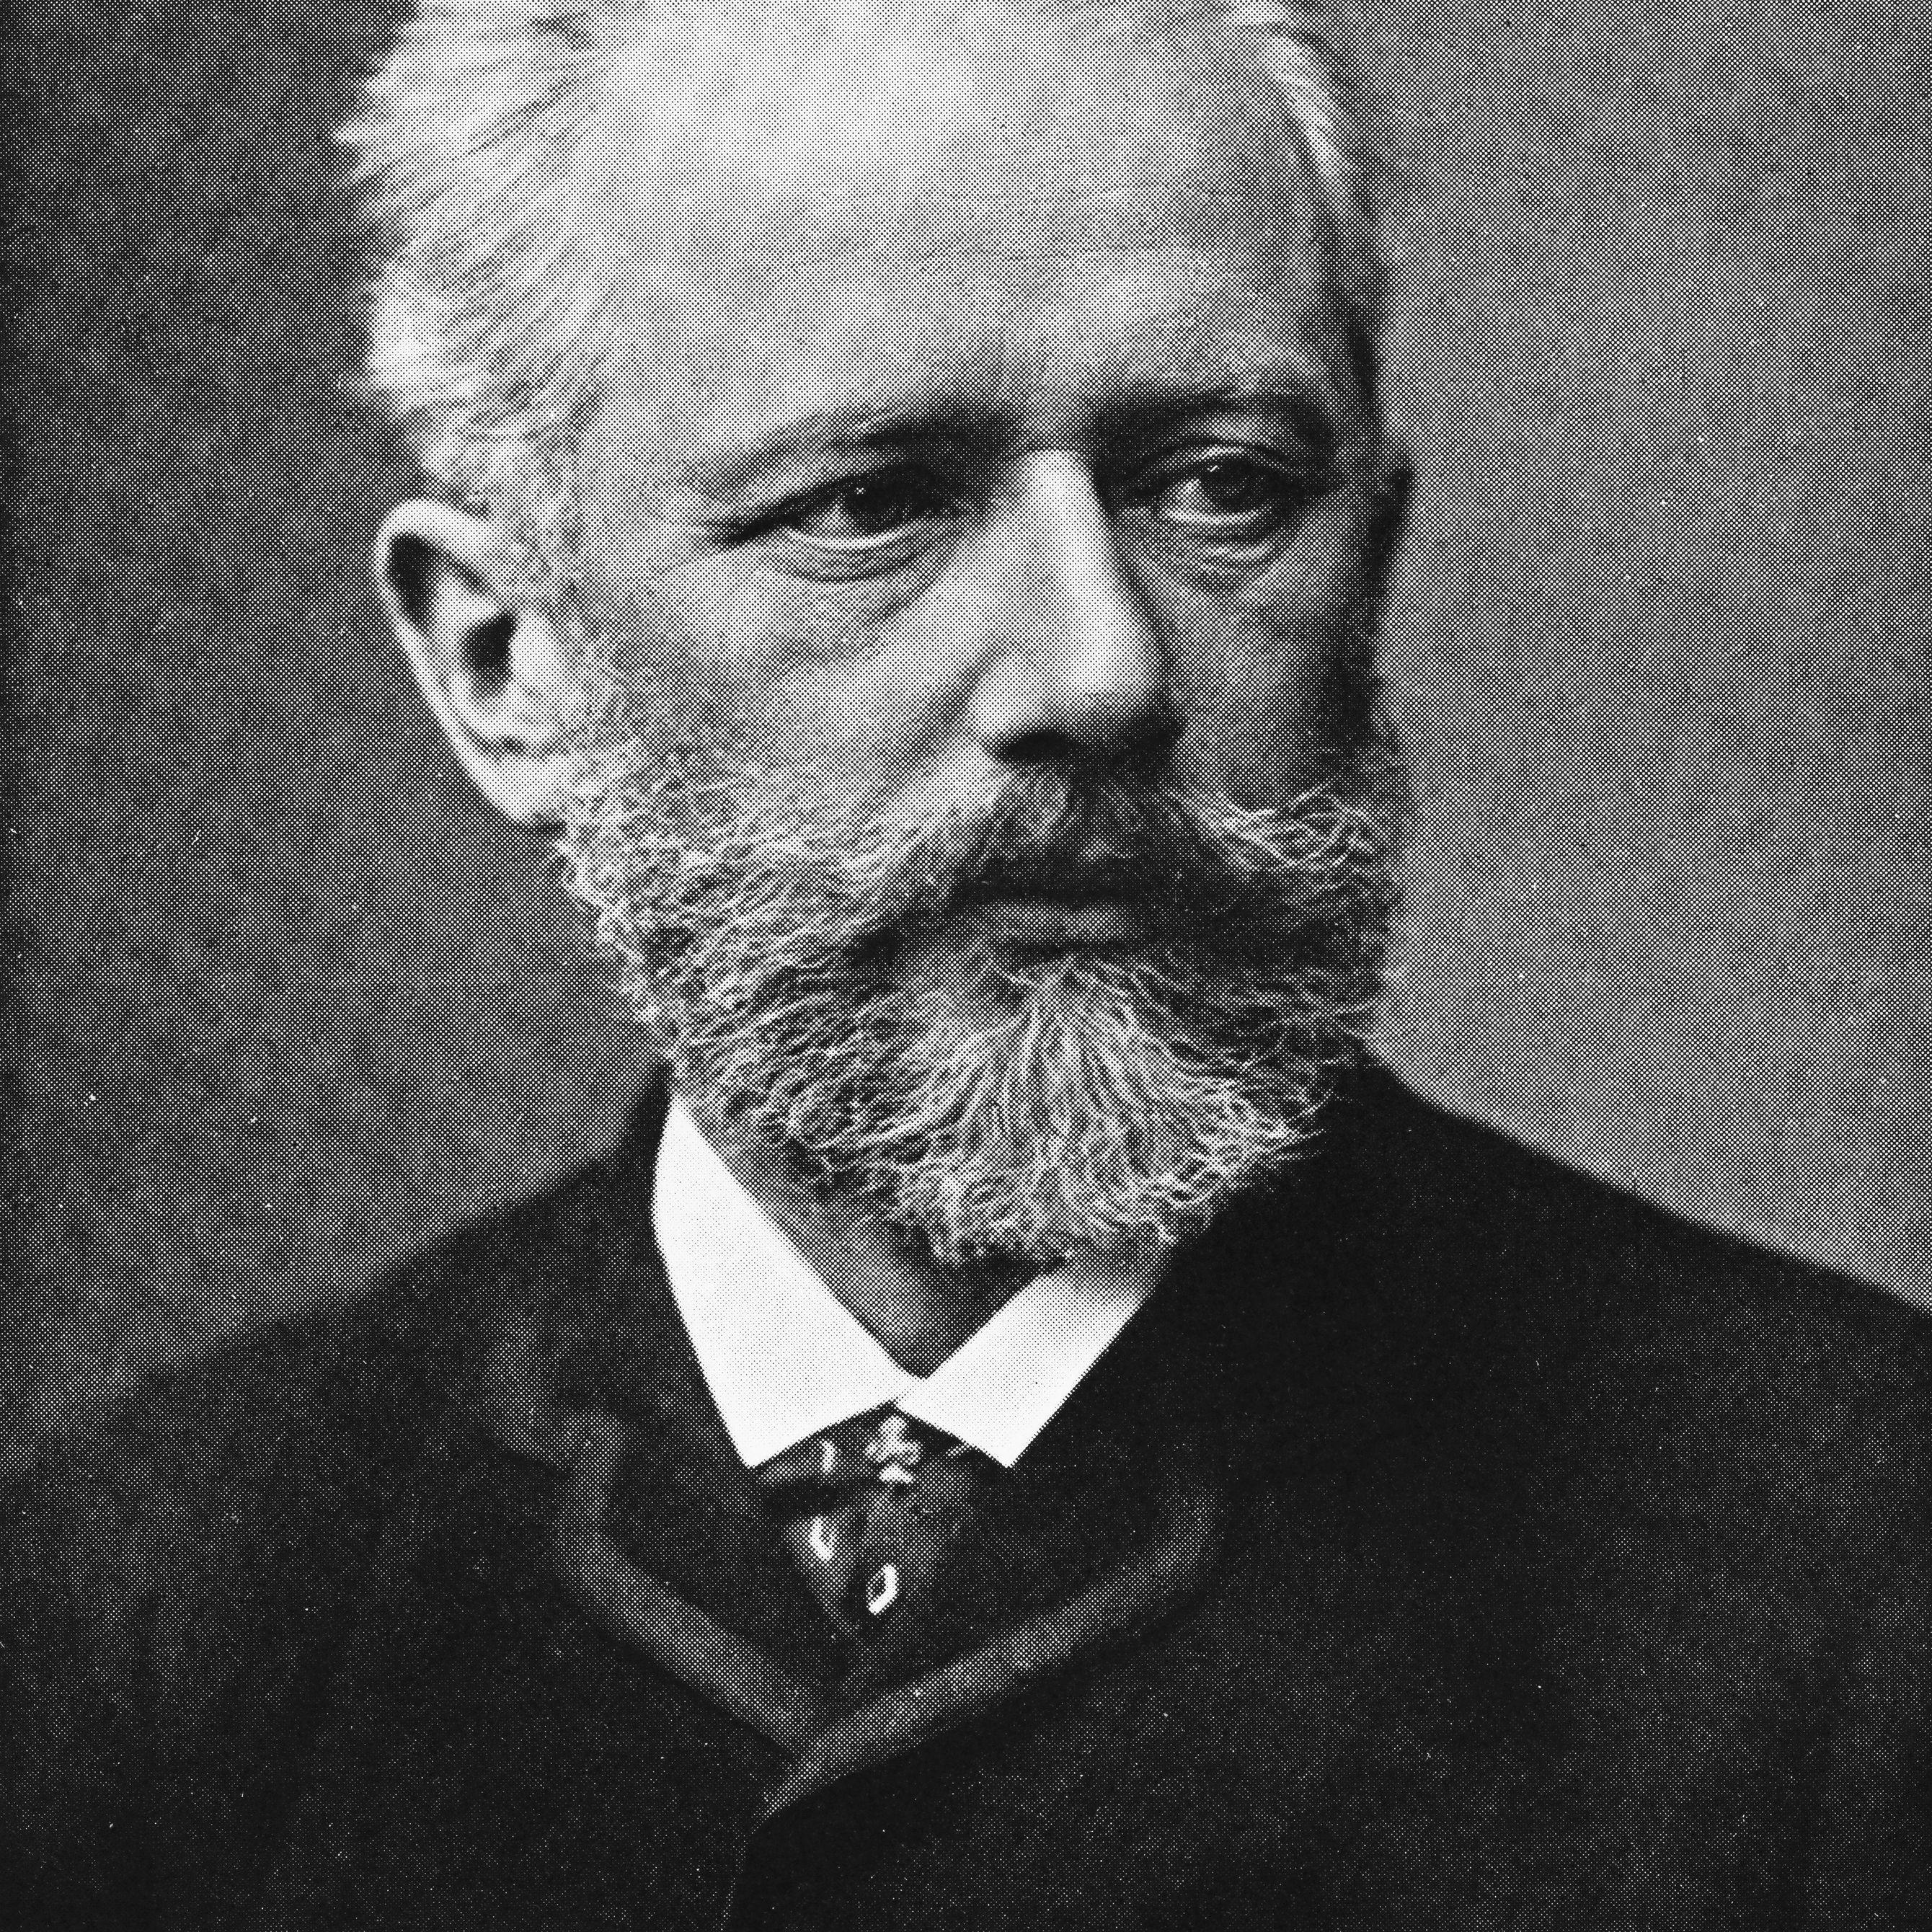 Tchaikovsky sitting for portrait